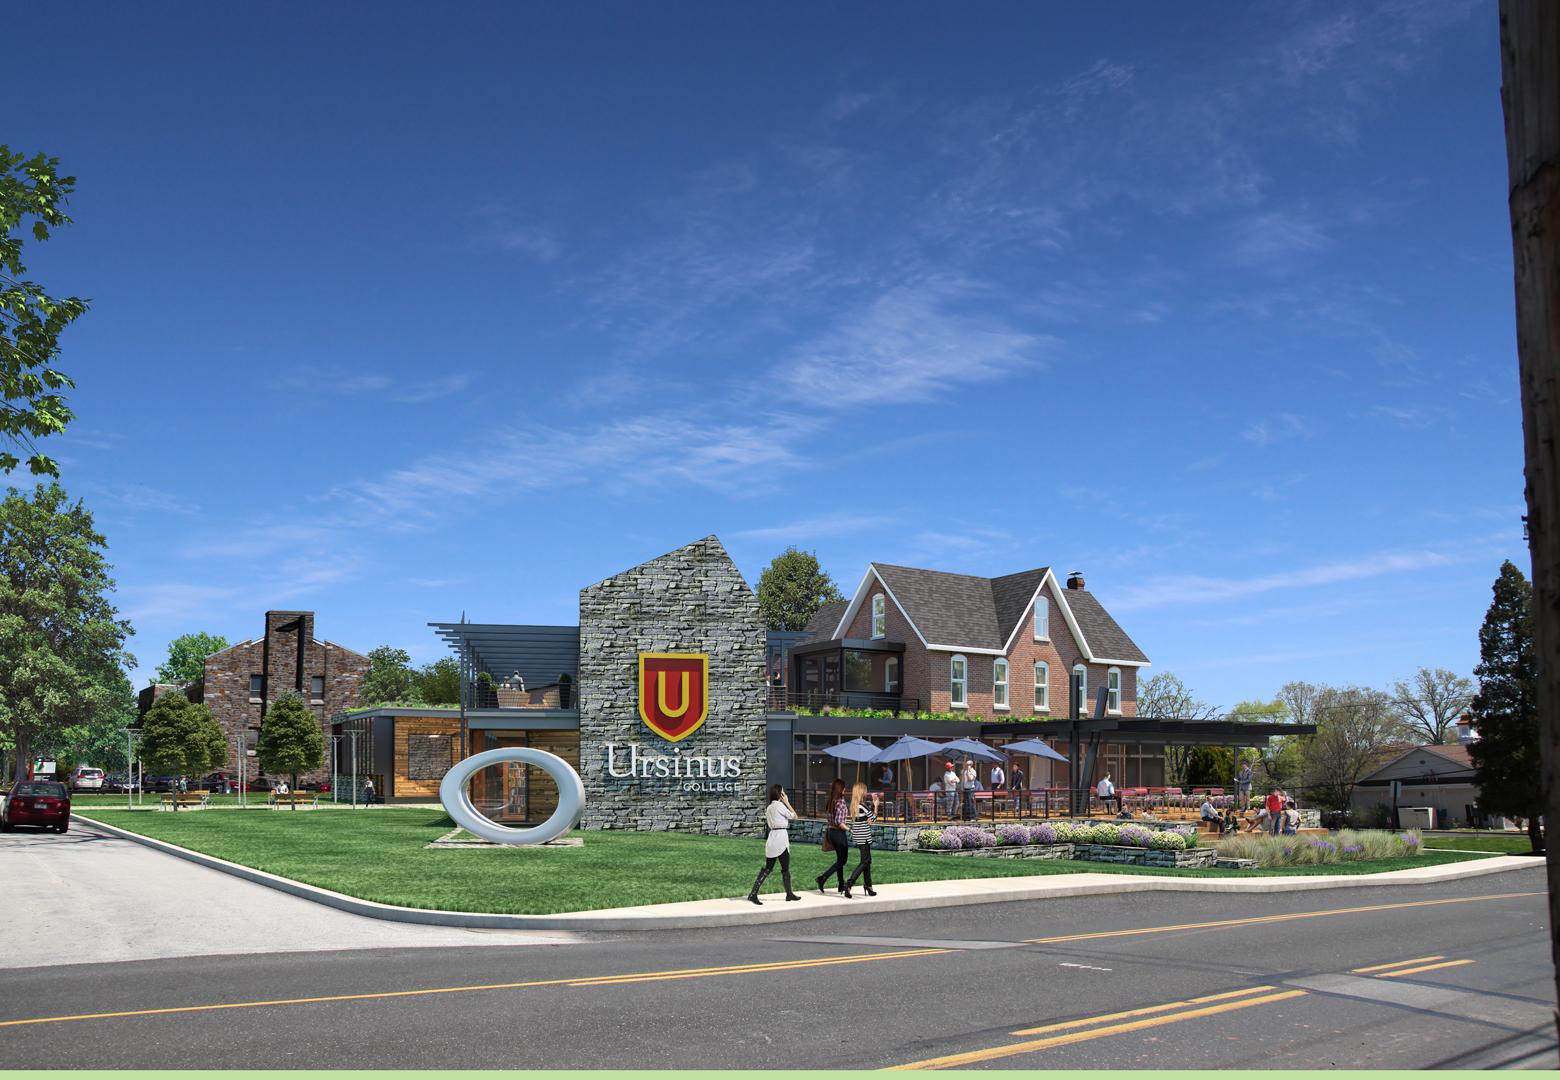 The Commons at Ursinus College